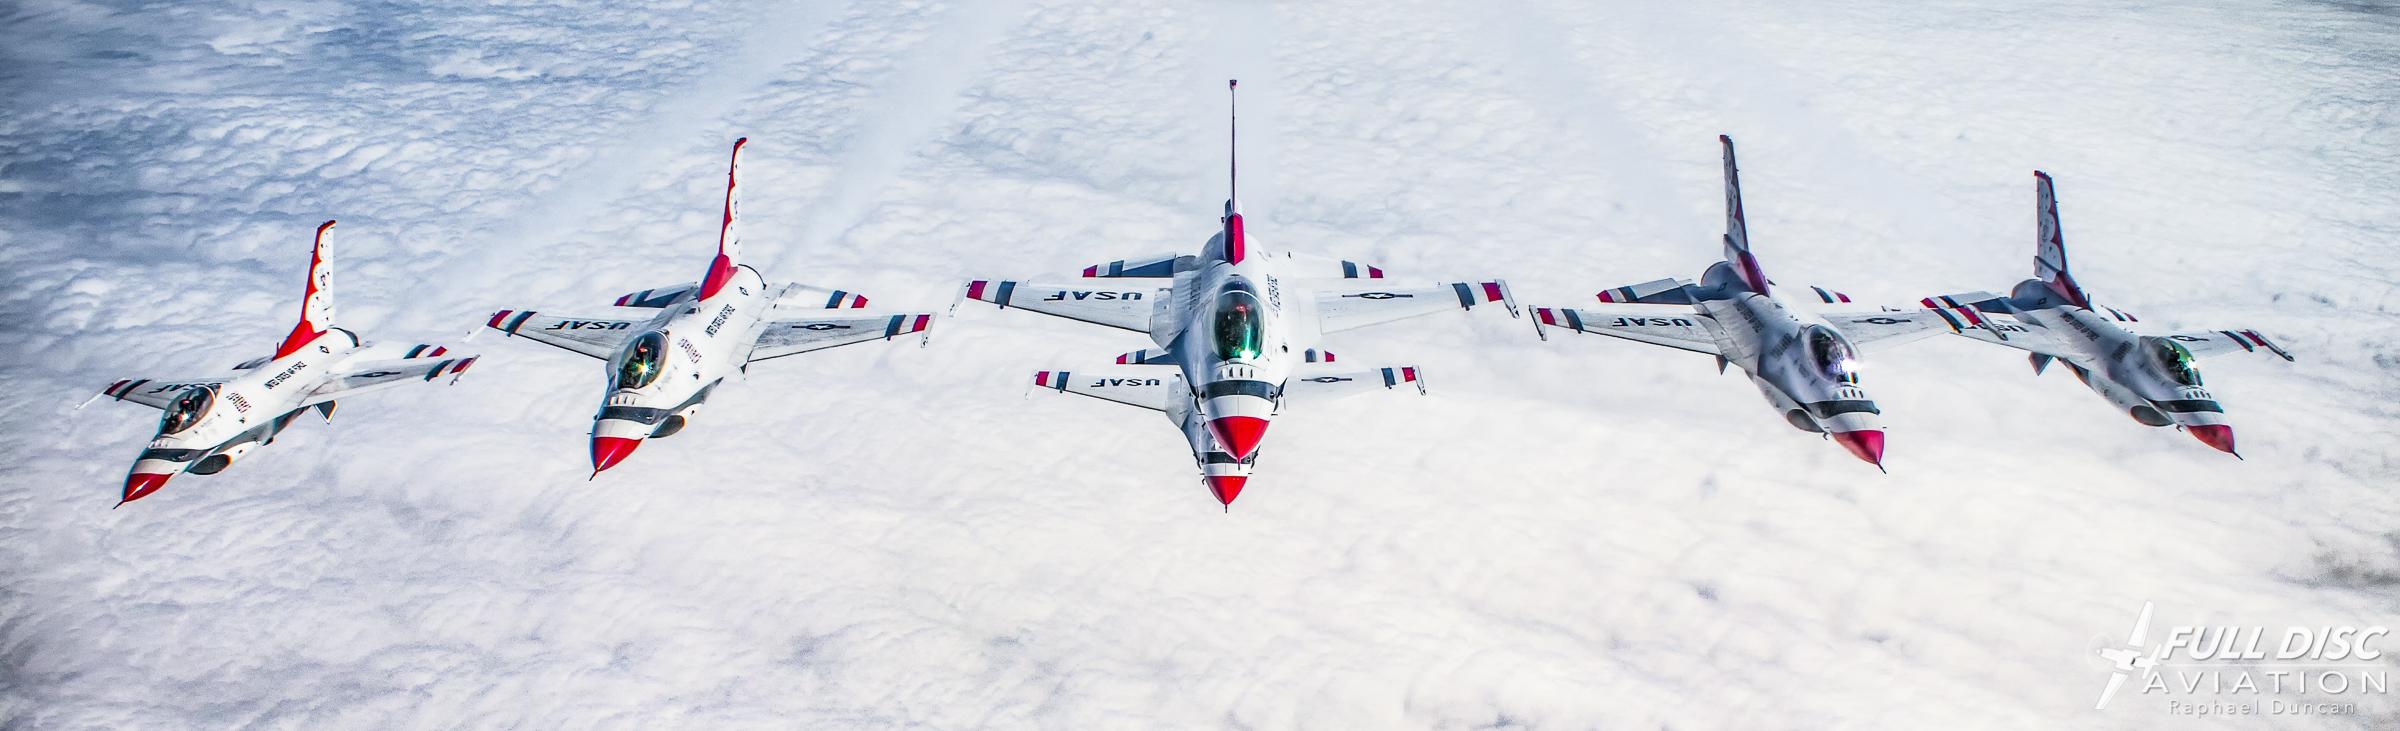 FullDiscAviaiton_RaphaelDuncan_Thunderbirds-February 18, 2019-02-2.jpg